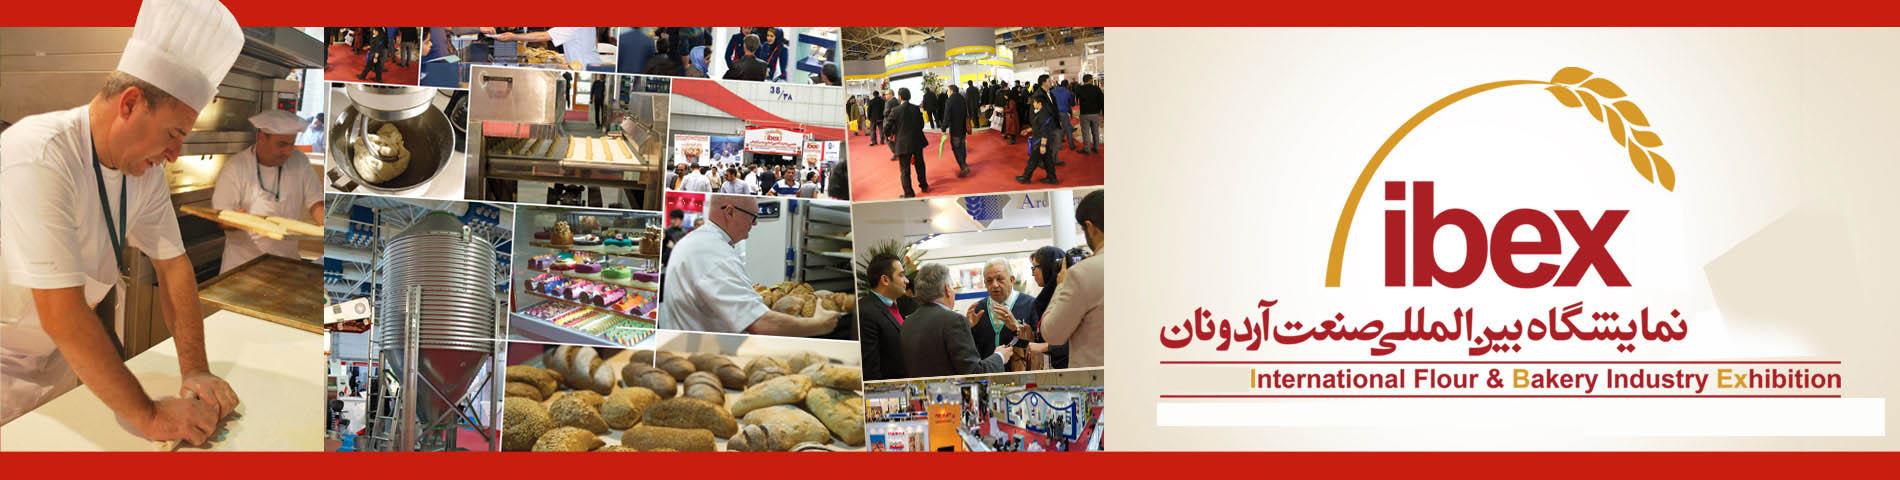 International Grain, Flour & Bakery Industry Exhibition